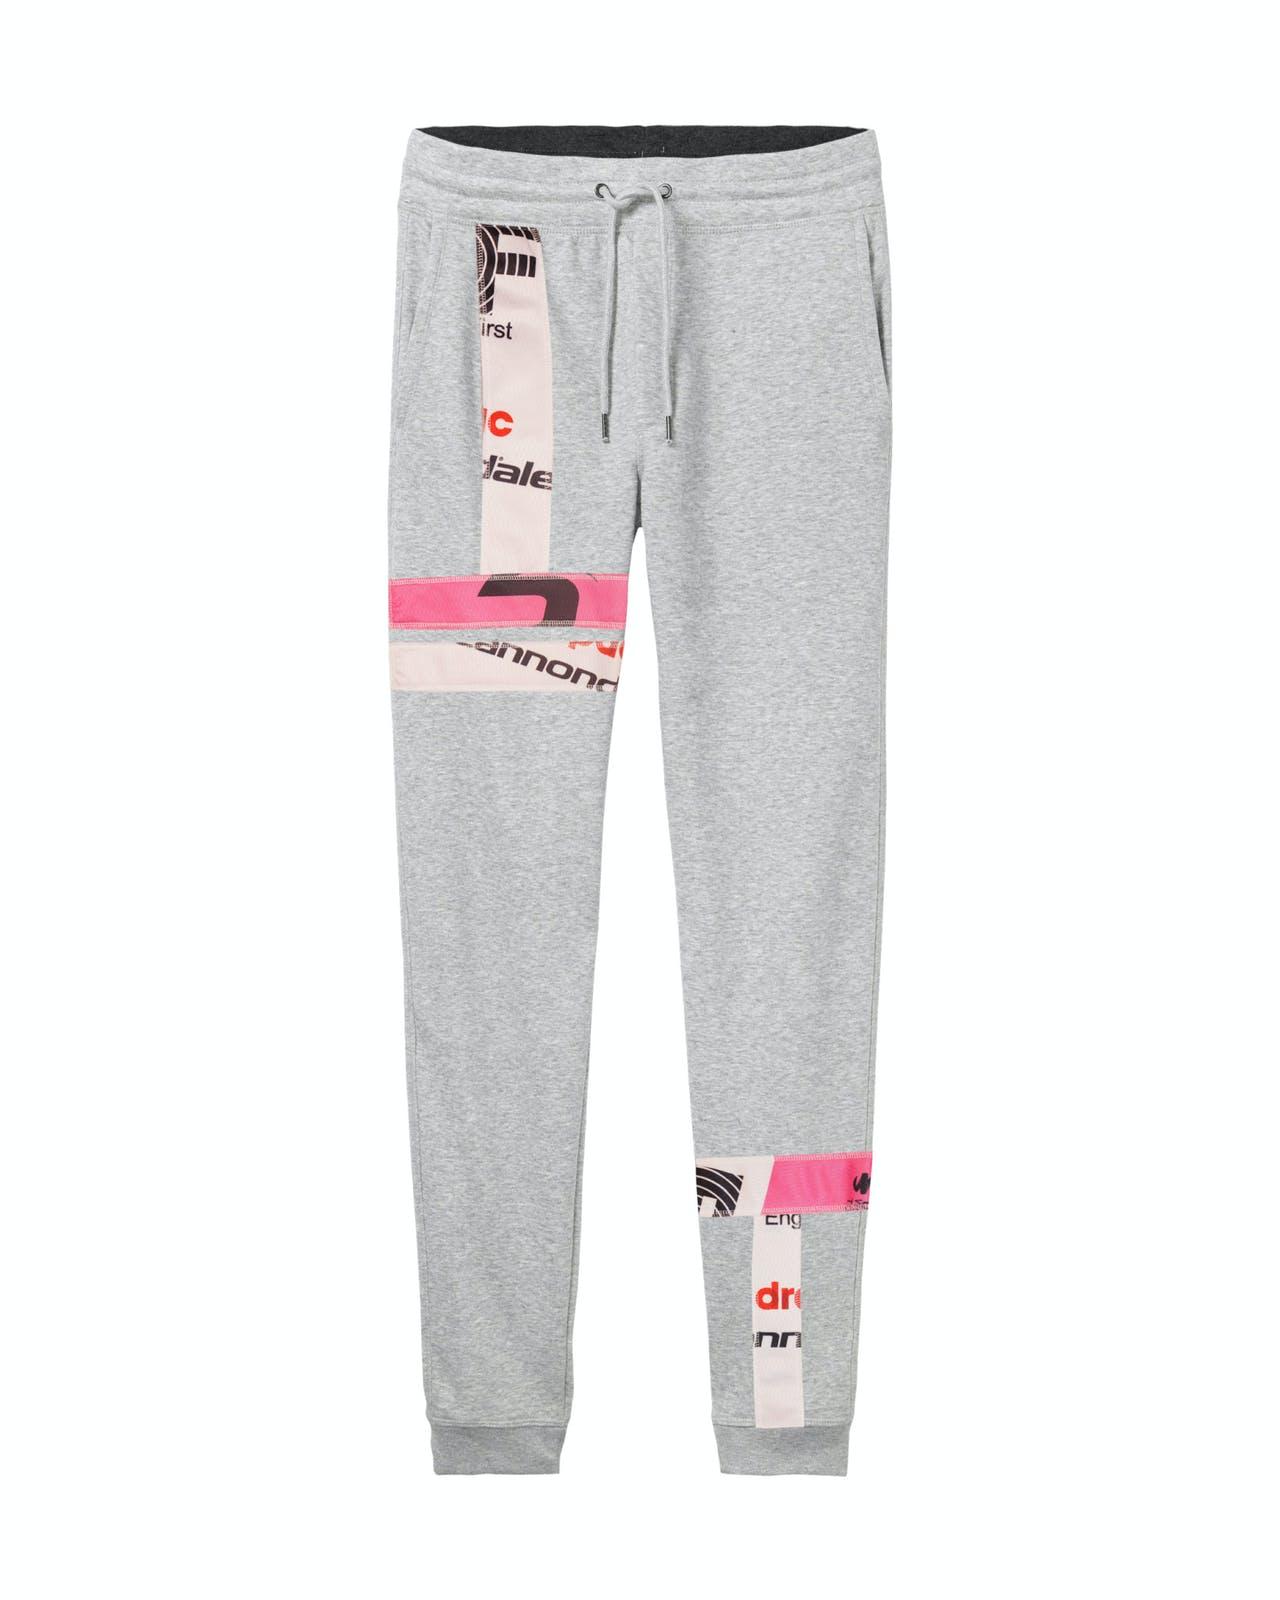 REmix joggers grey